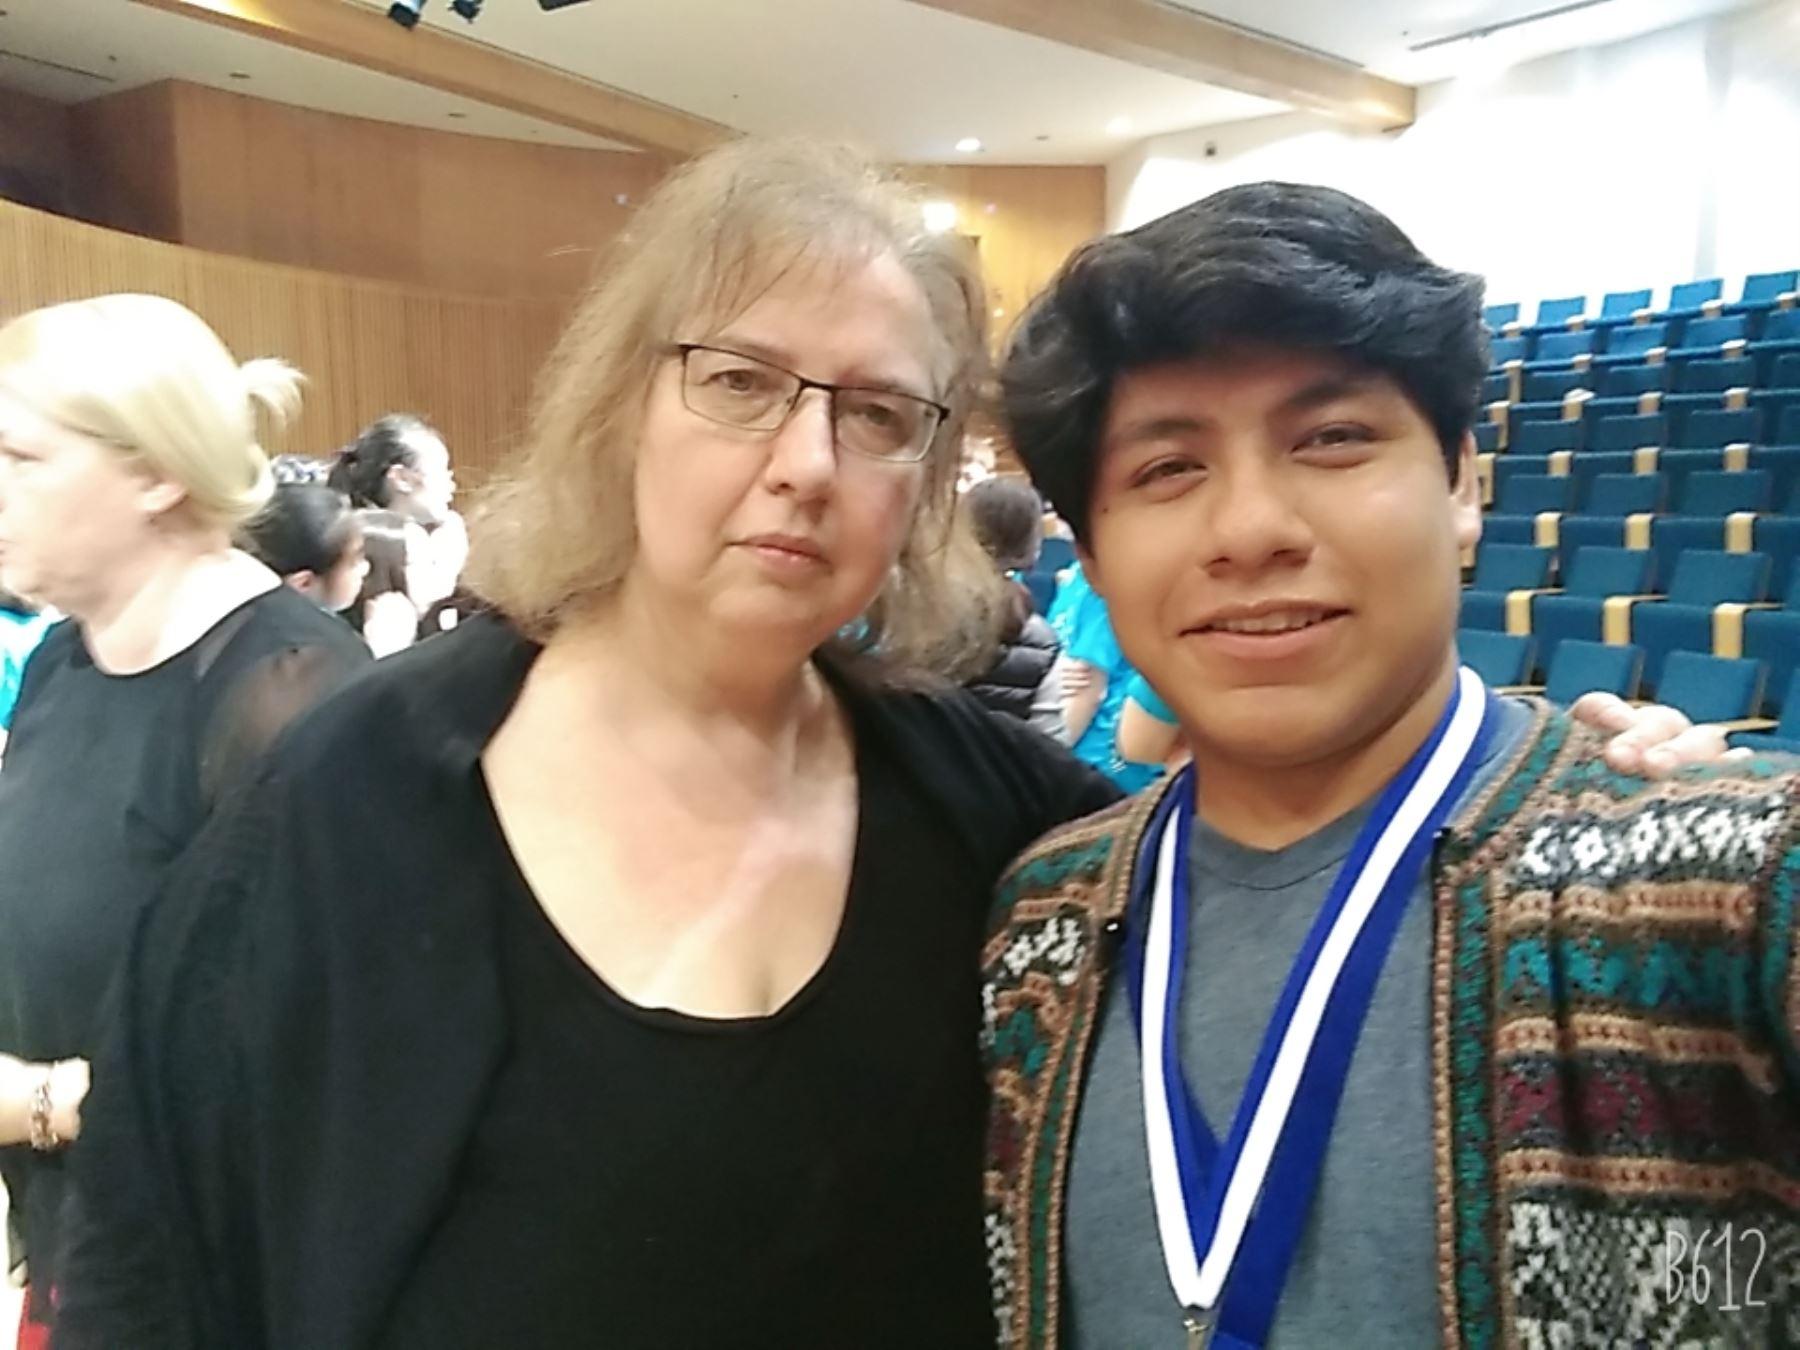 El joven flautista peruano Erwin Calcina obtuvo el tercer puesto en el Tercer Festival Internacional de Flauta de Tel Aviv.